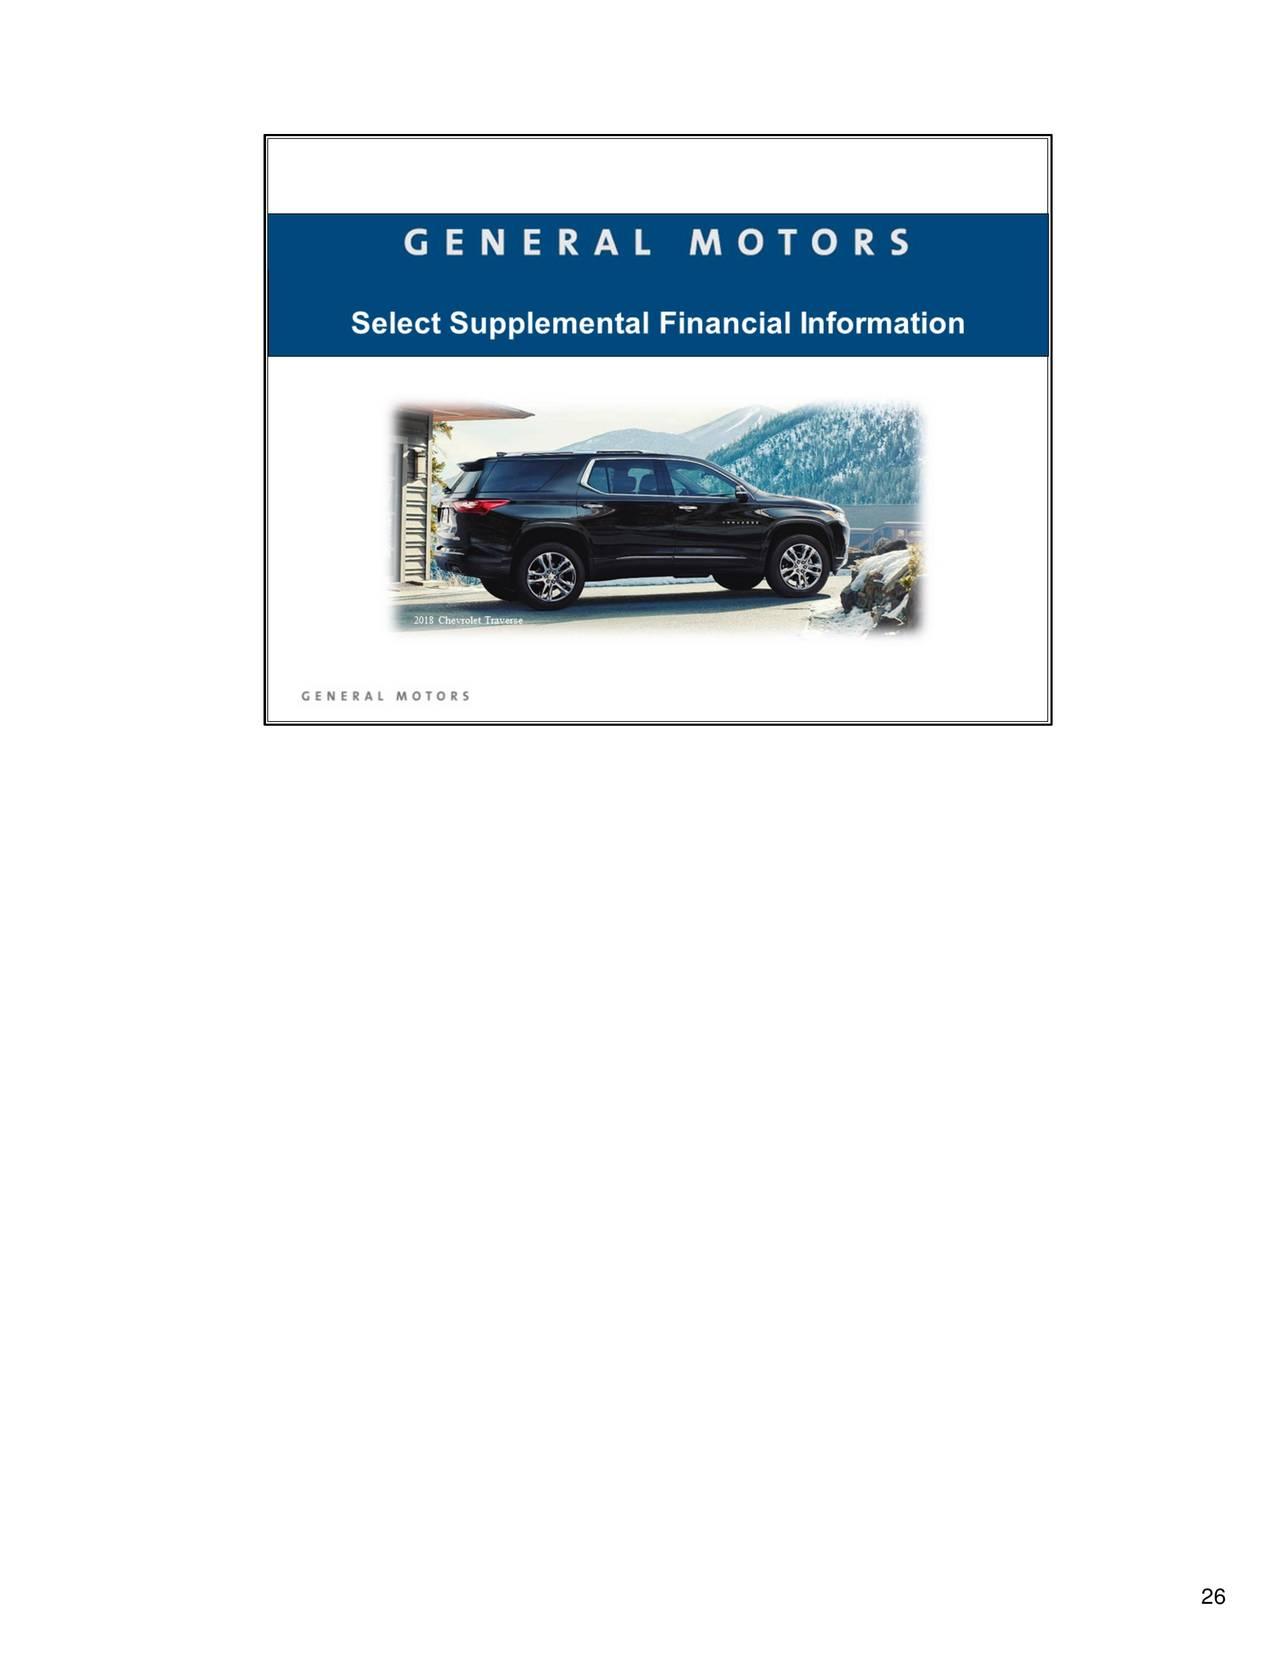 General Motors Company 2017 Q1 Results Earnings Call